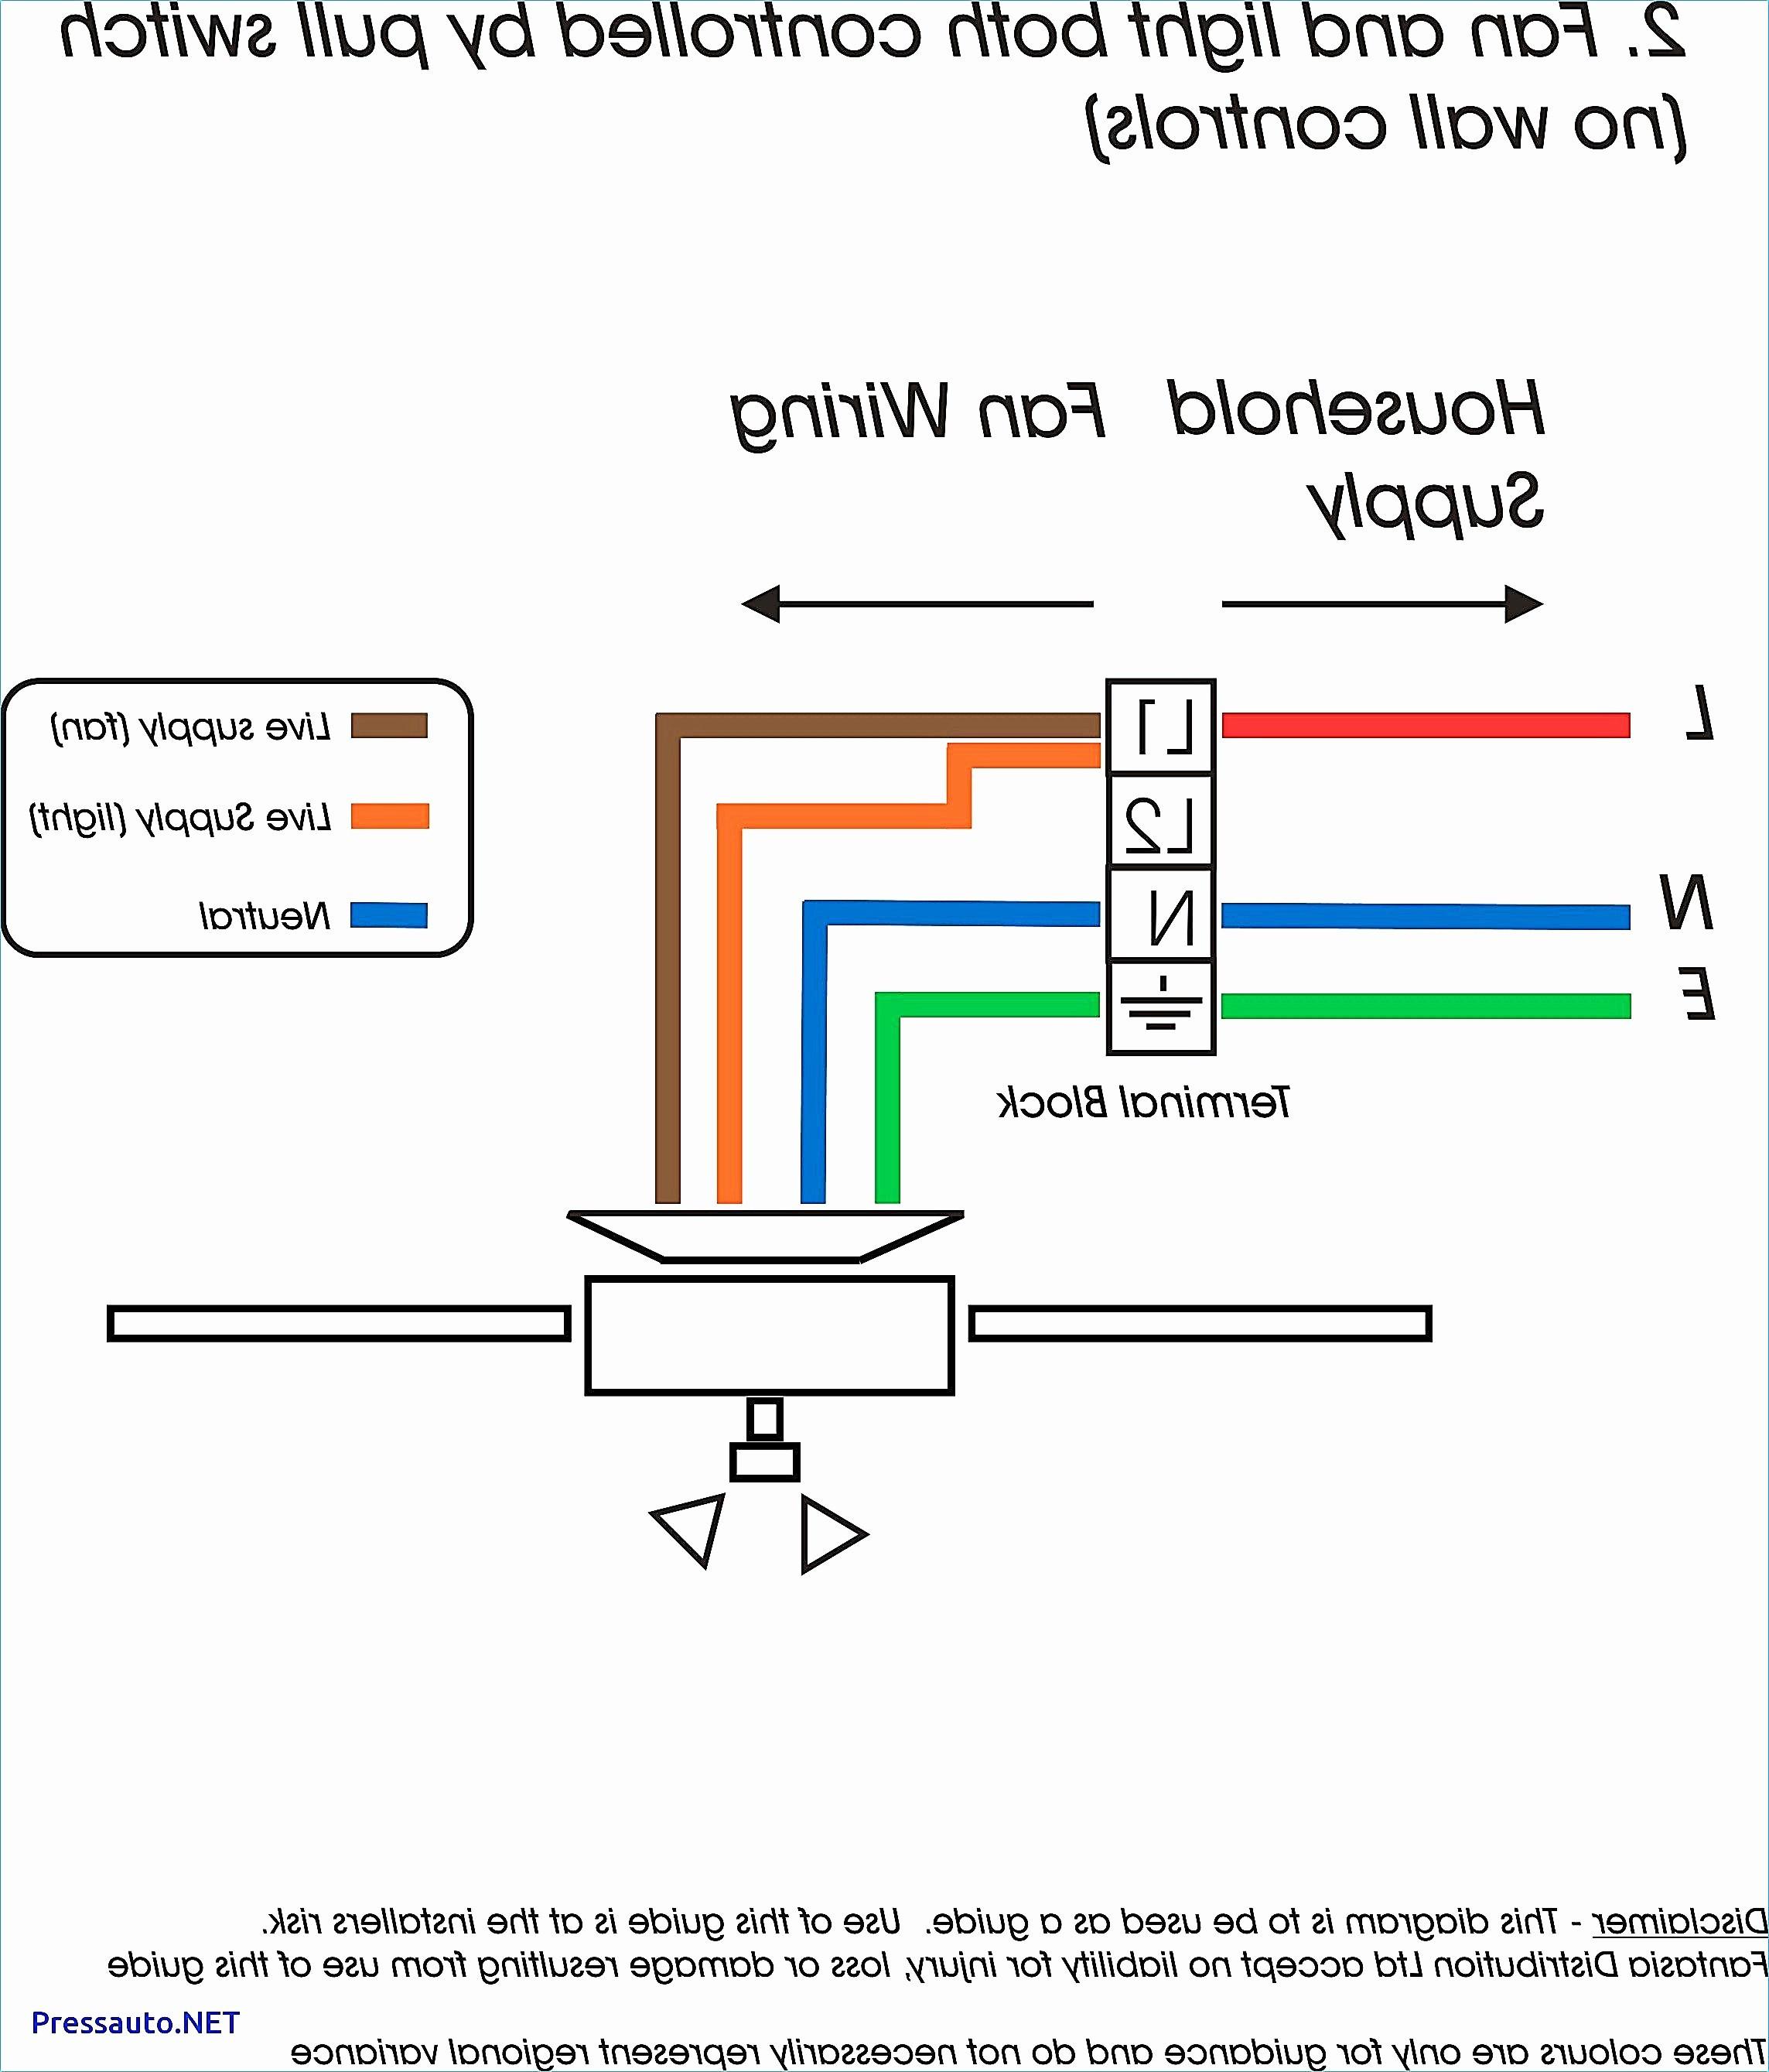 marley baseboard heater wiring diagram Collection-Fahrenheat Baseboard Heater Wiring Diagram Save Baseboard Heaters Fahrenheat Baseboard Heater Wiring Diagram 240V Fahrenheat Baseboard Heater Wiring Diagram 8-i